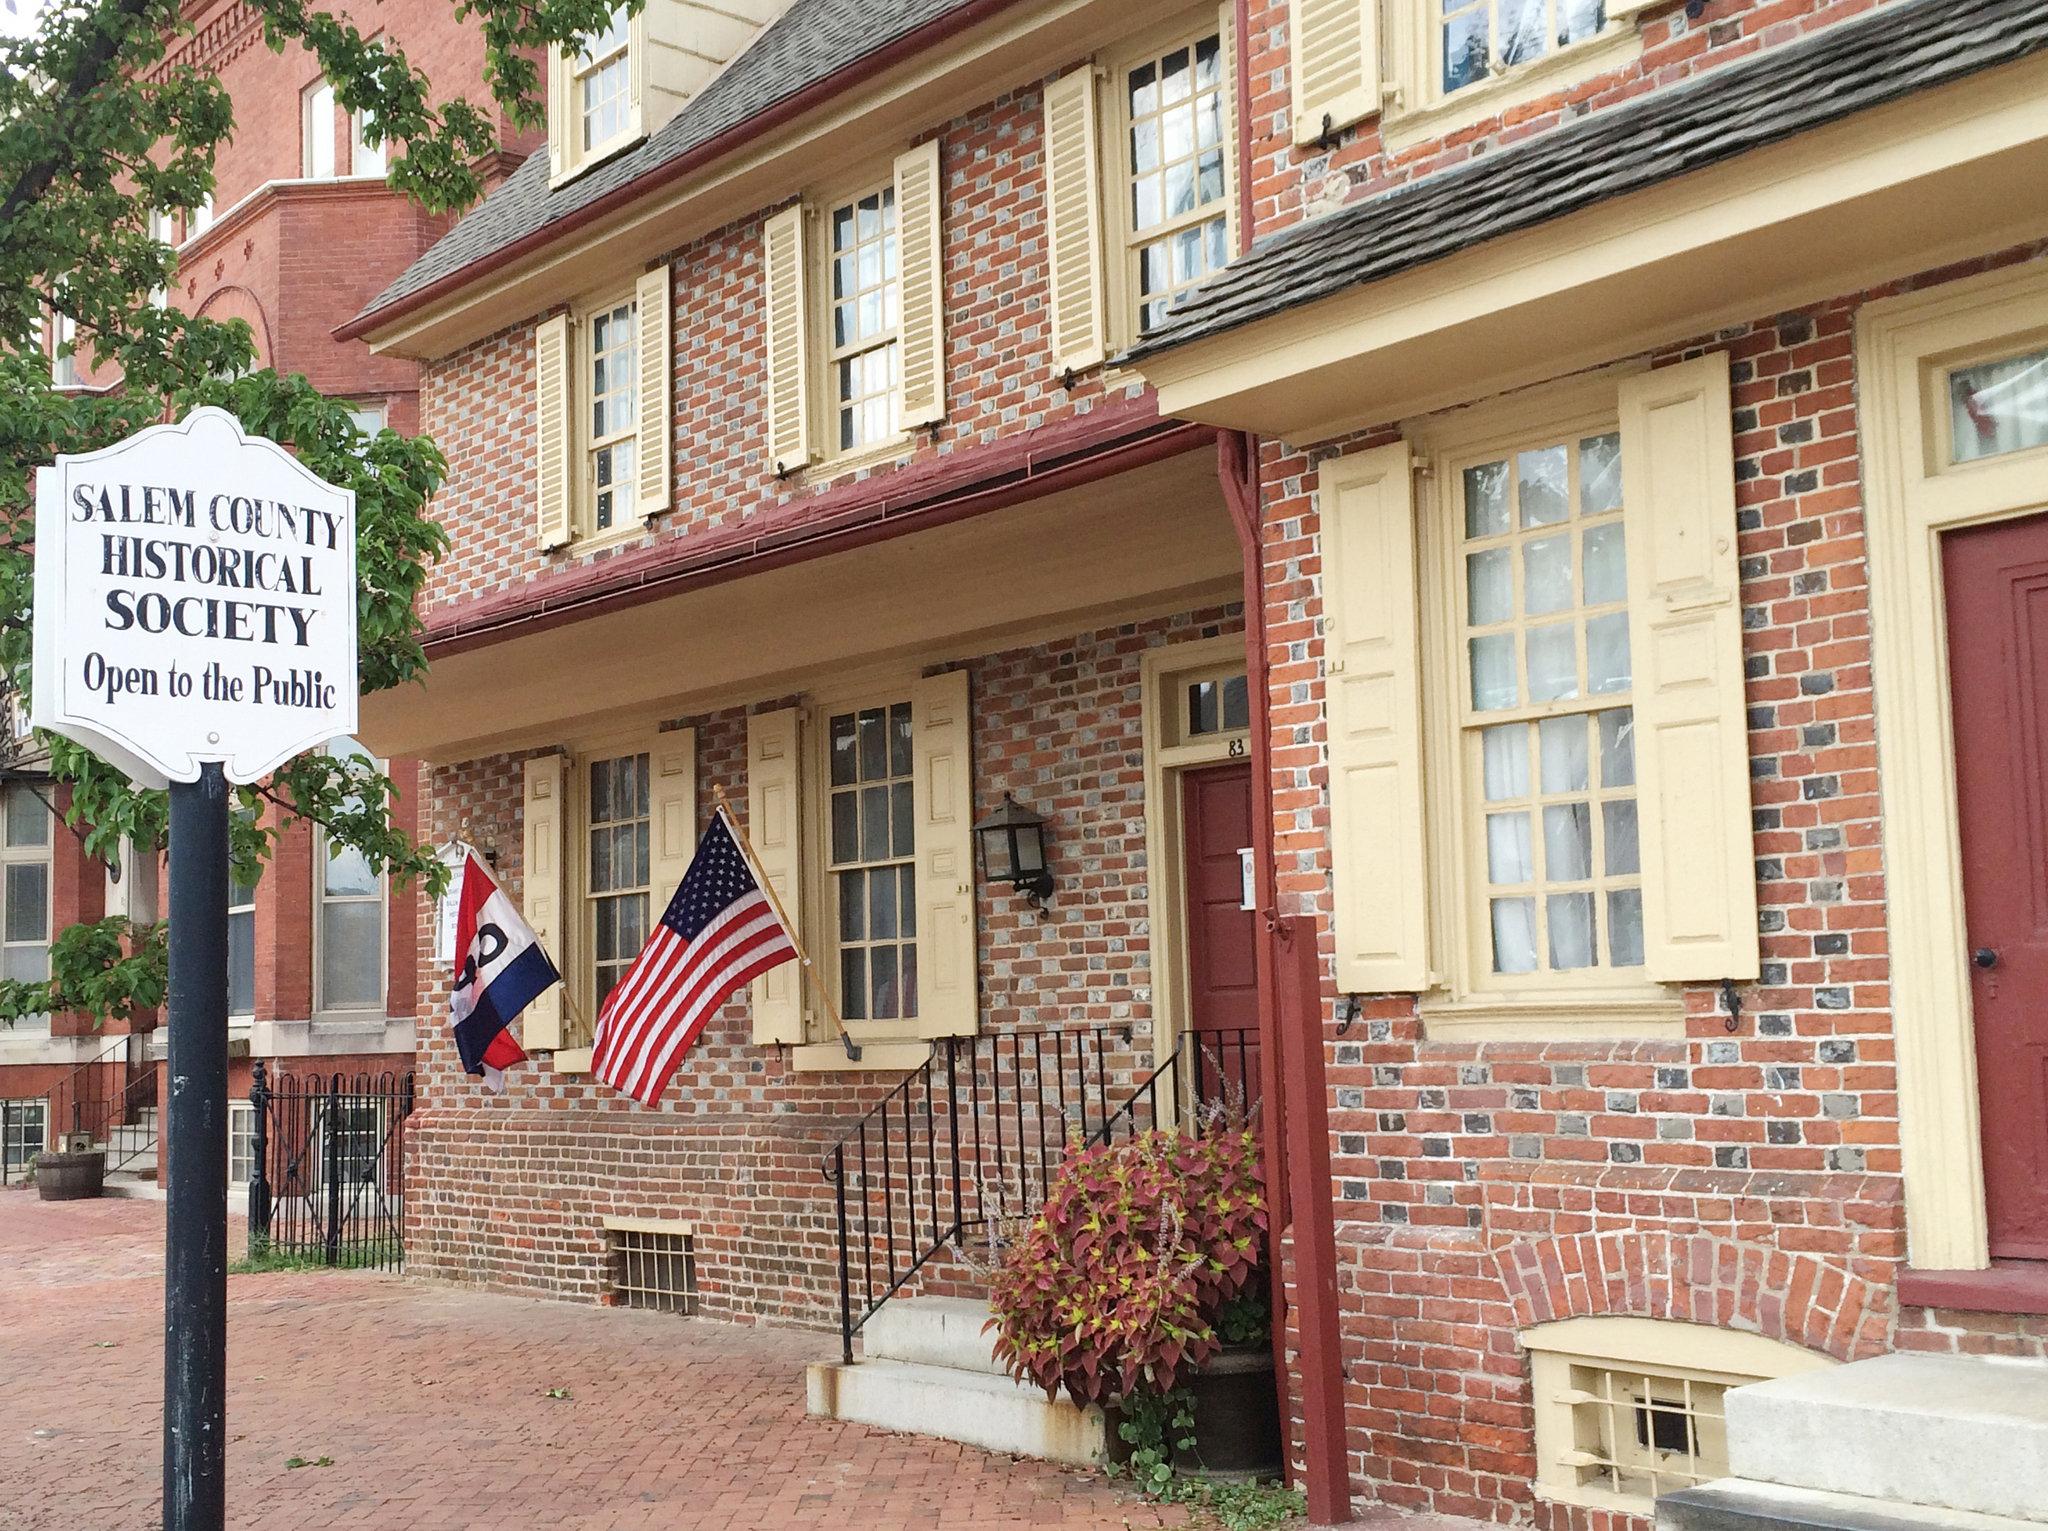 The Salem County Historical Society